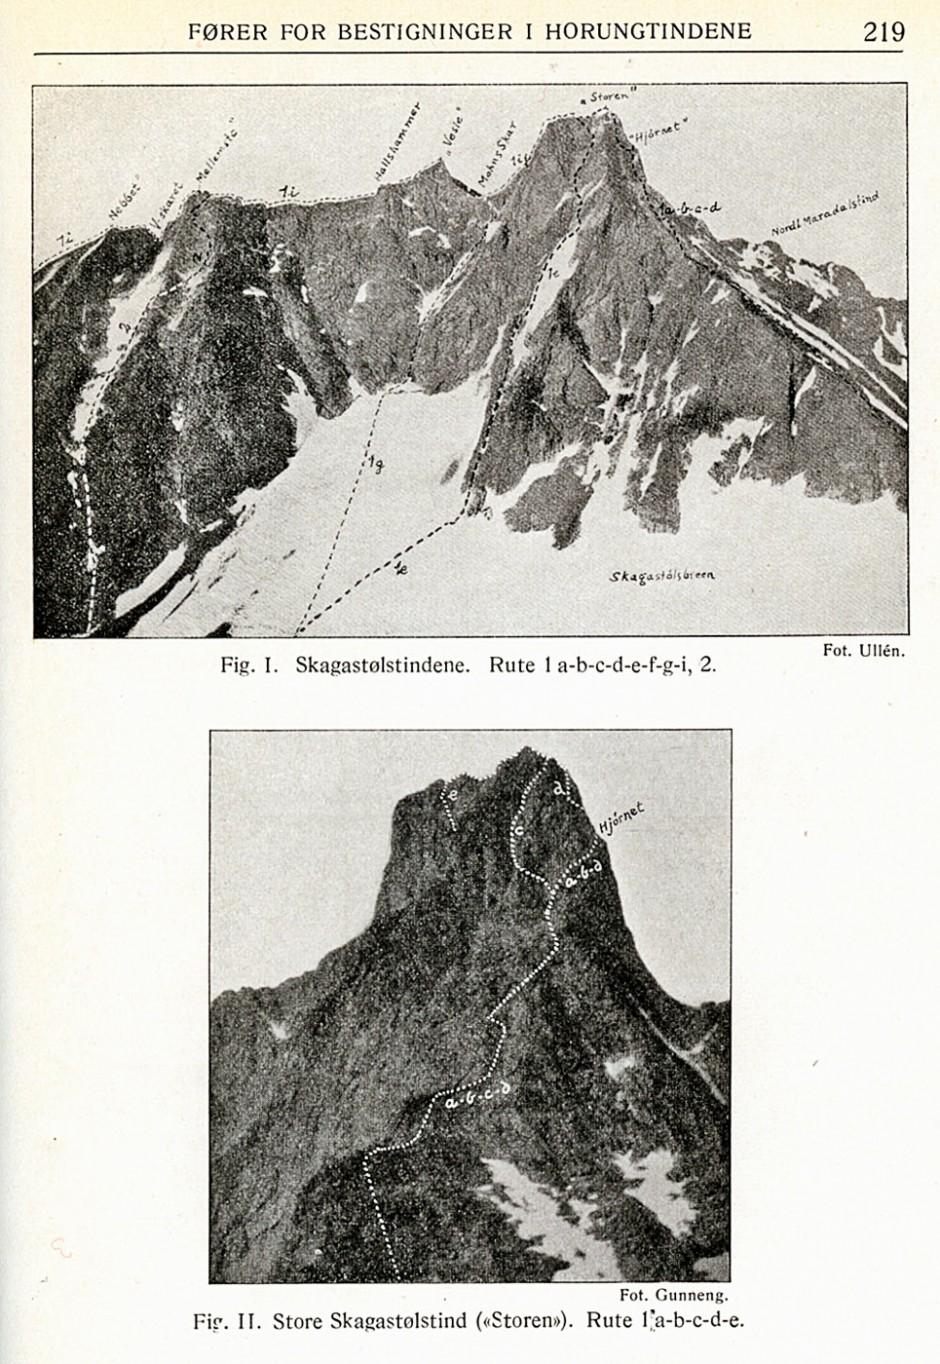 1928 s 219 Hurrungan